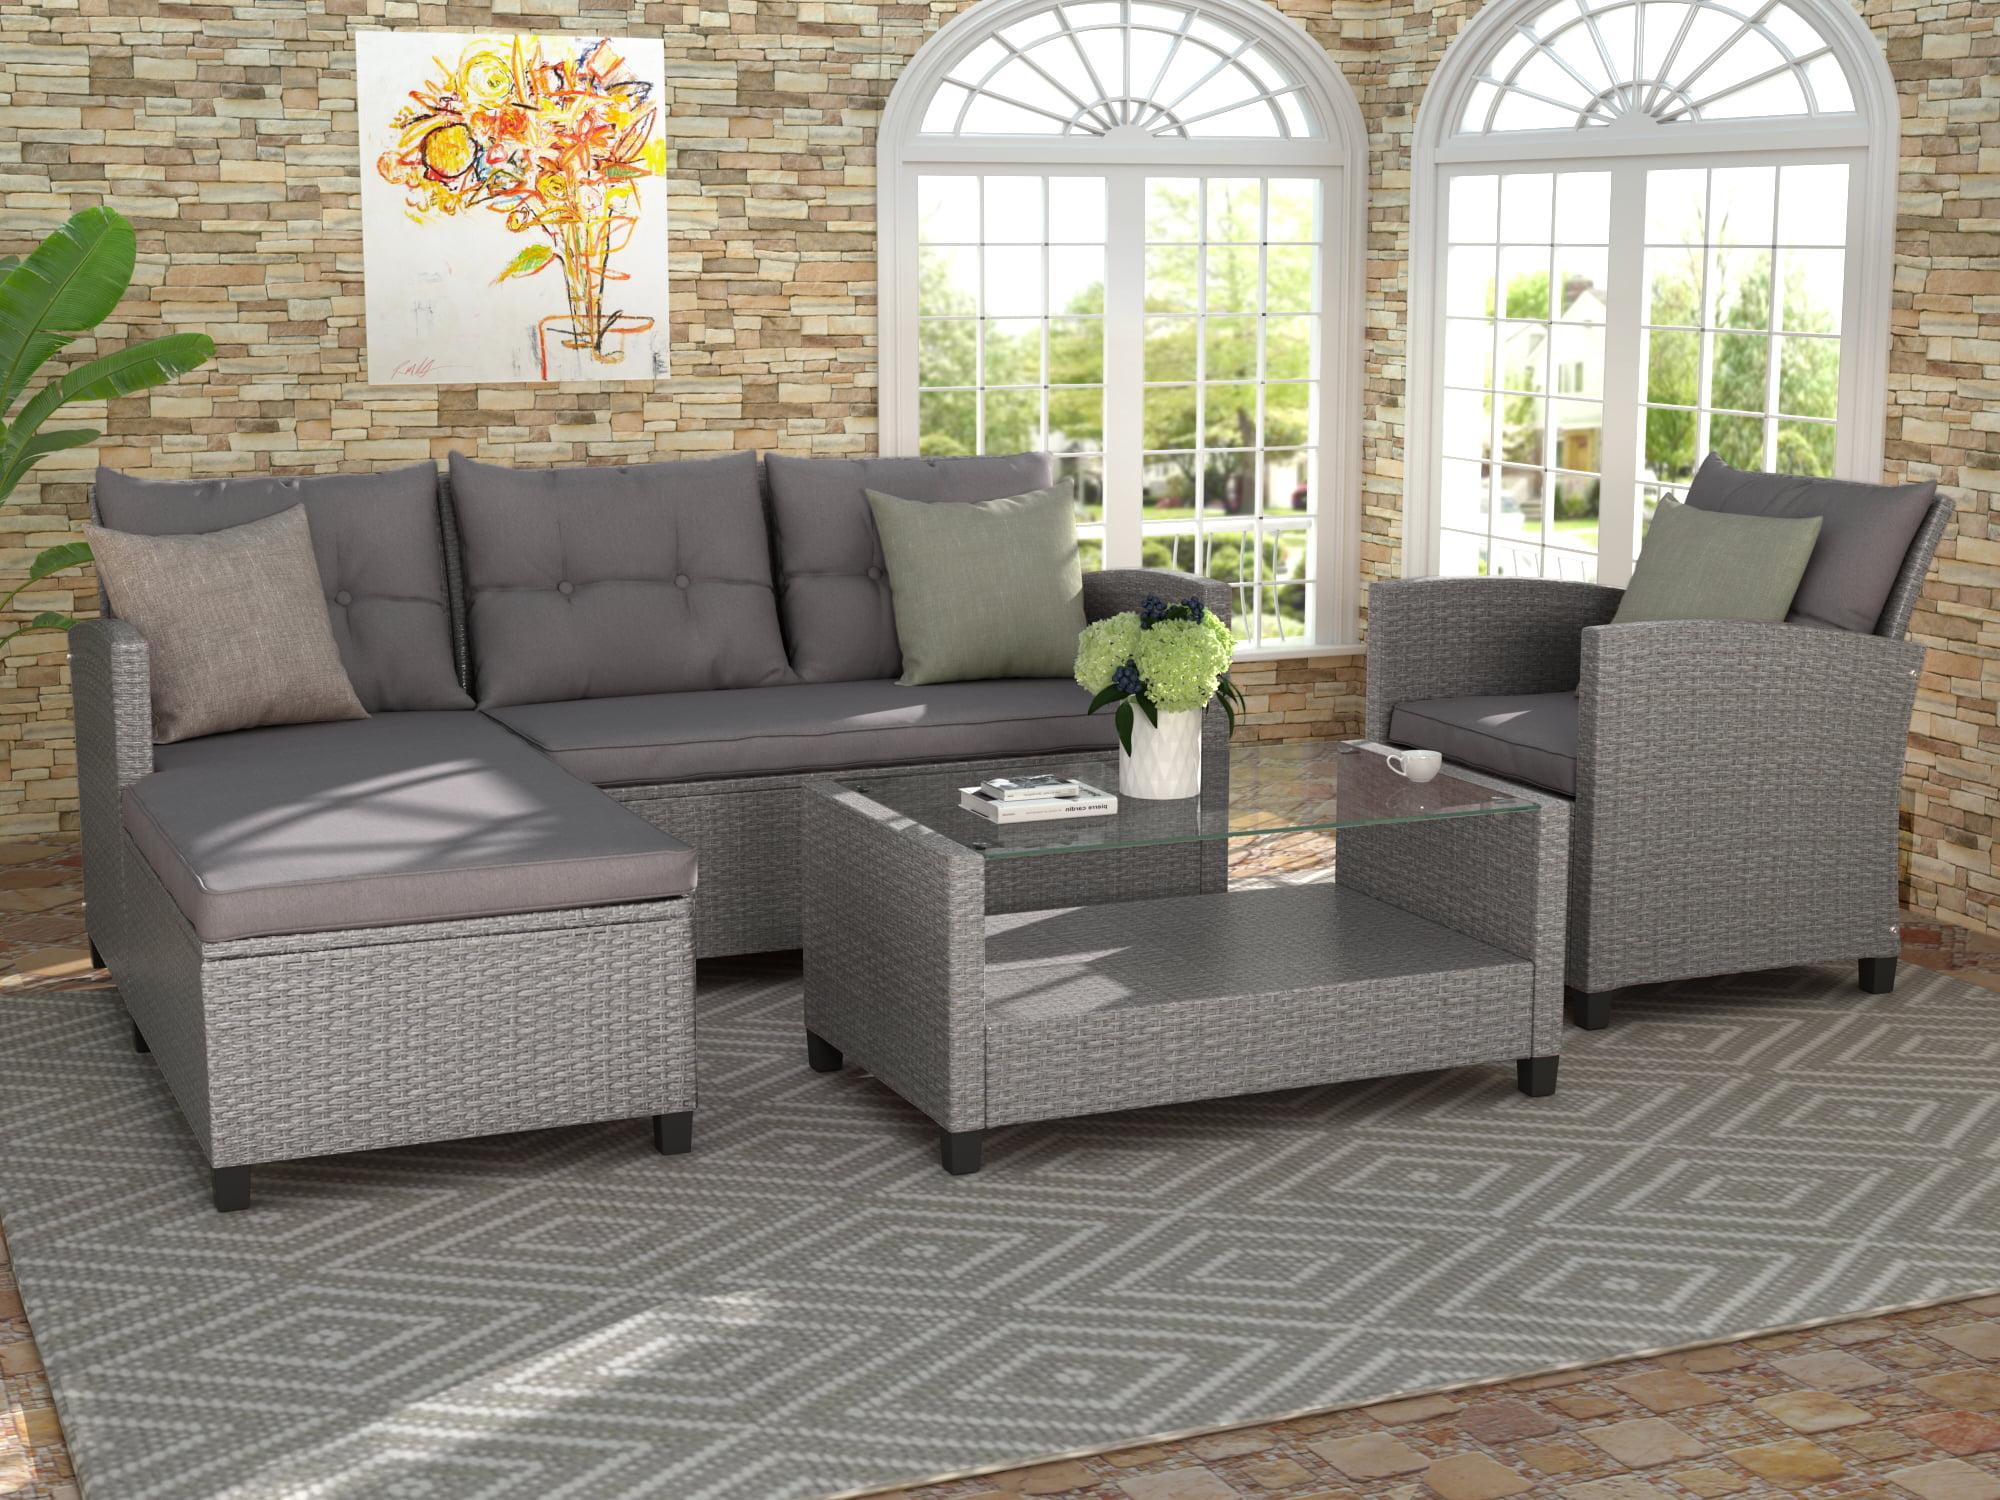 Clearance! Rattan Patio Sofa Set, 4 Pieces Outdoor ...